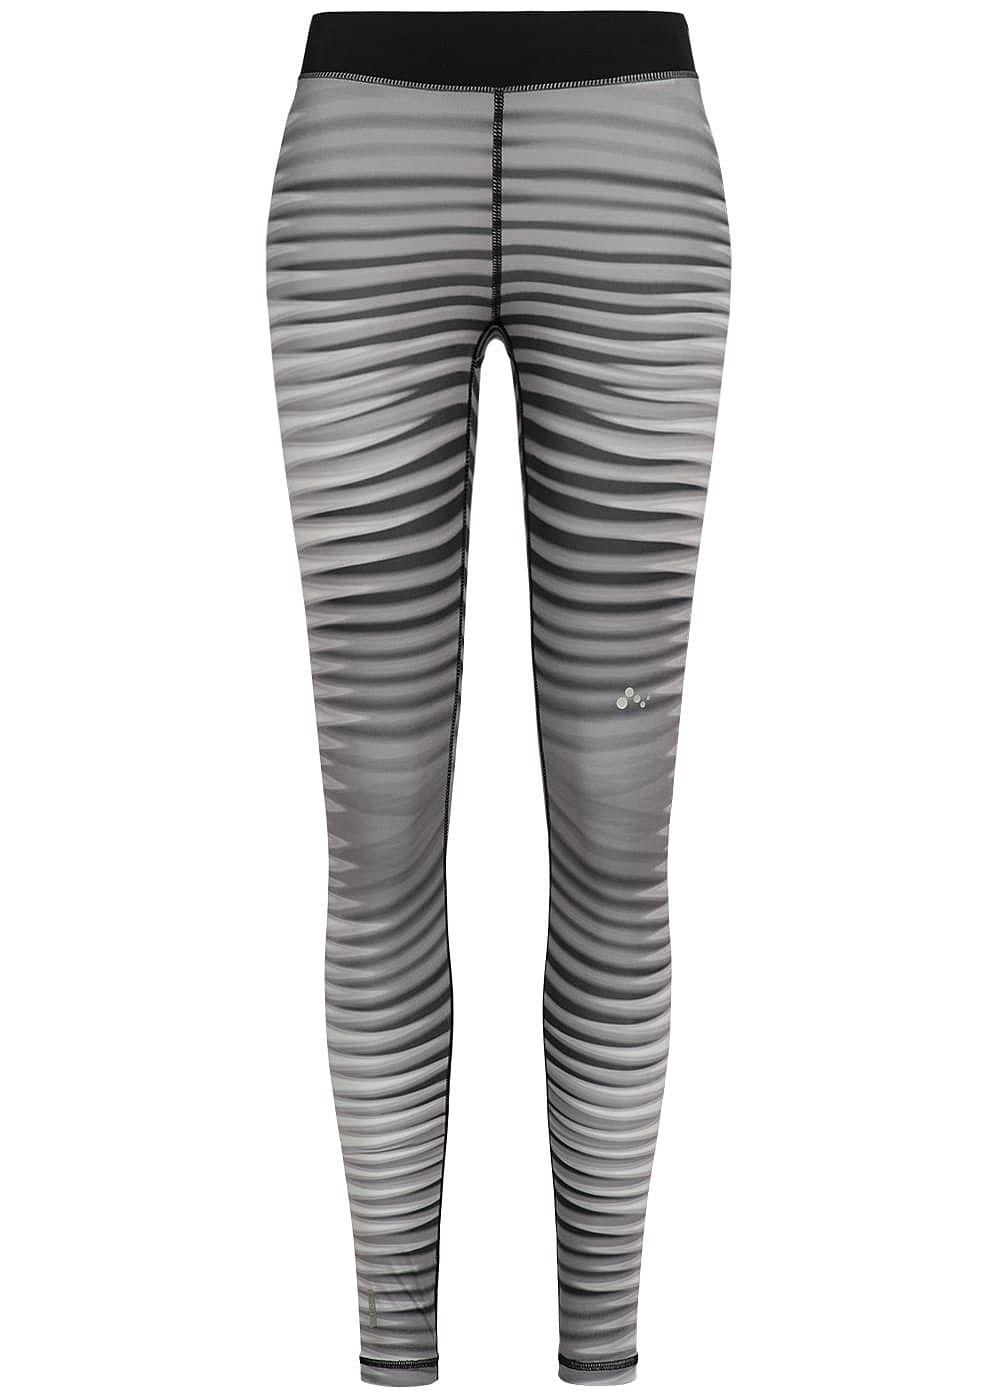 only damen trainings tights leggings streifen schwarz weiss 77onlineshop. Black Bedroom Furniture Sets. Home Design Ideas